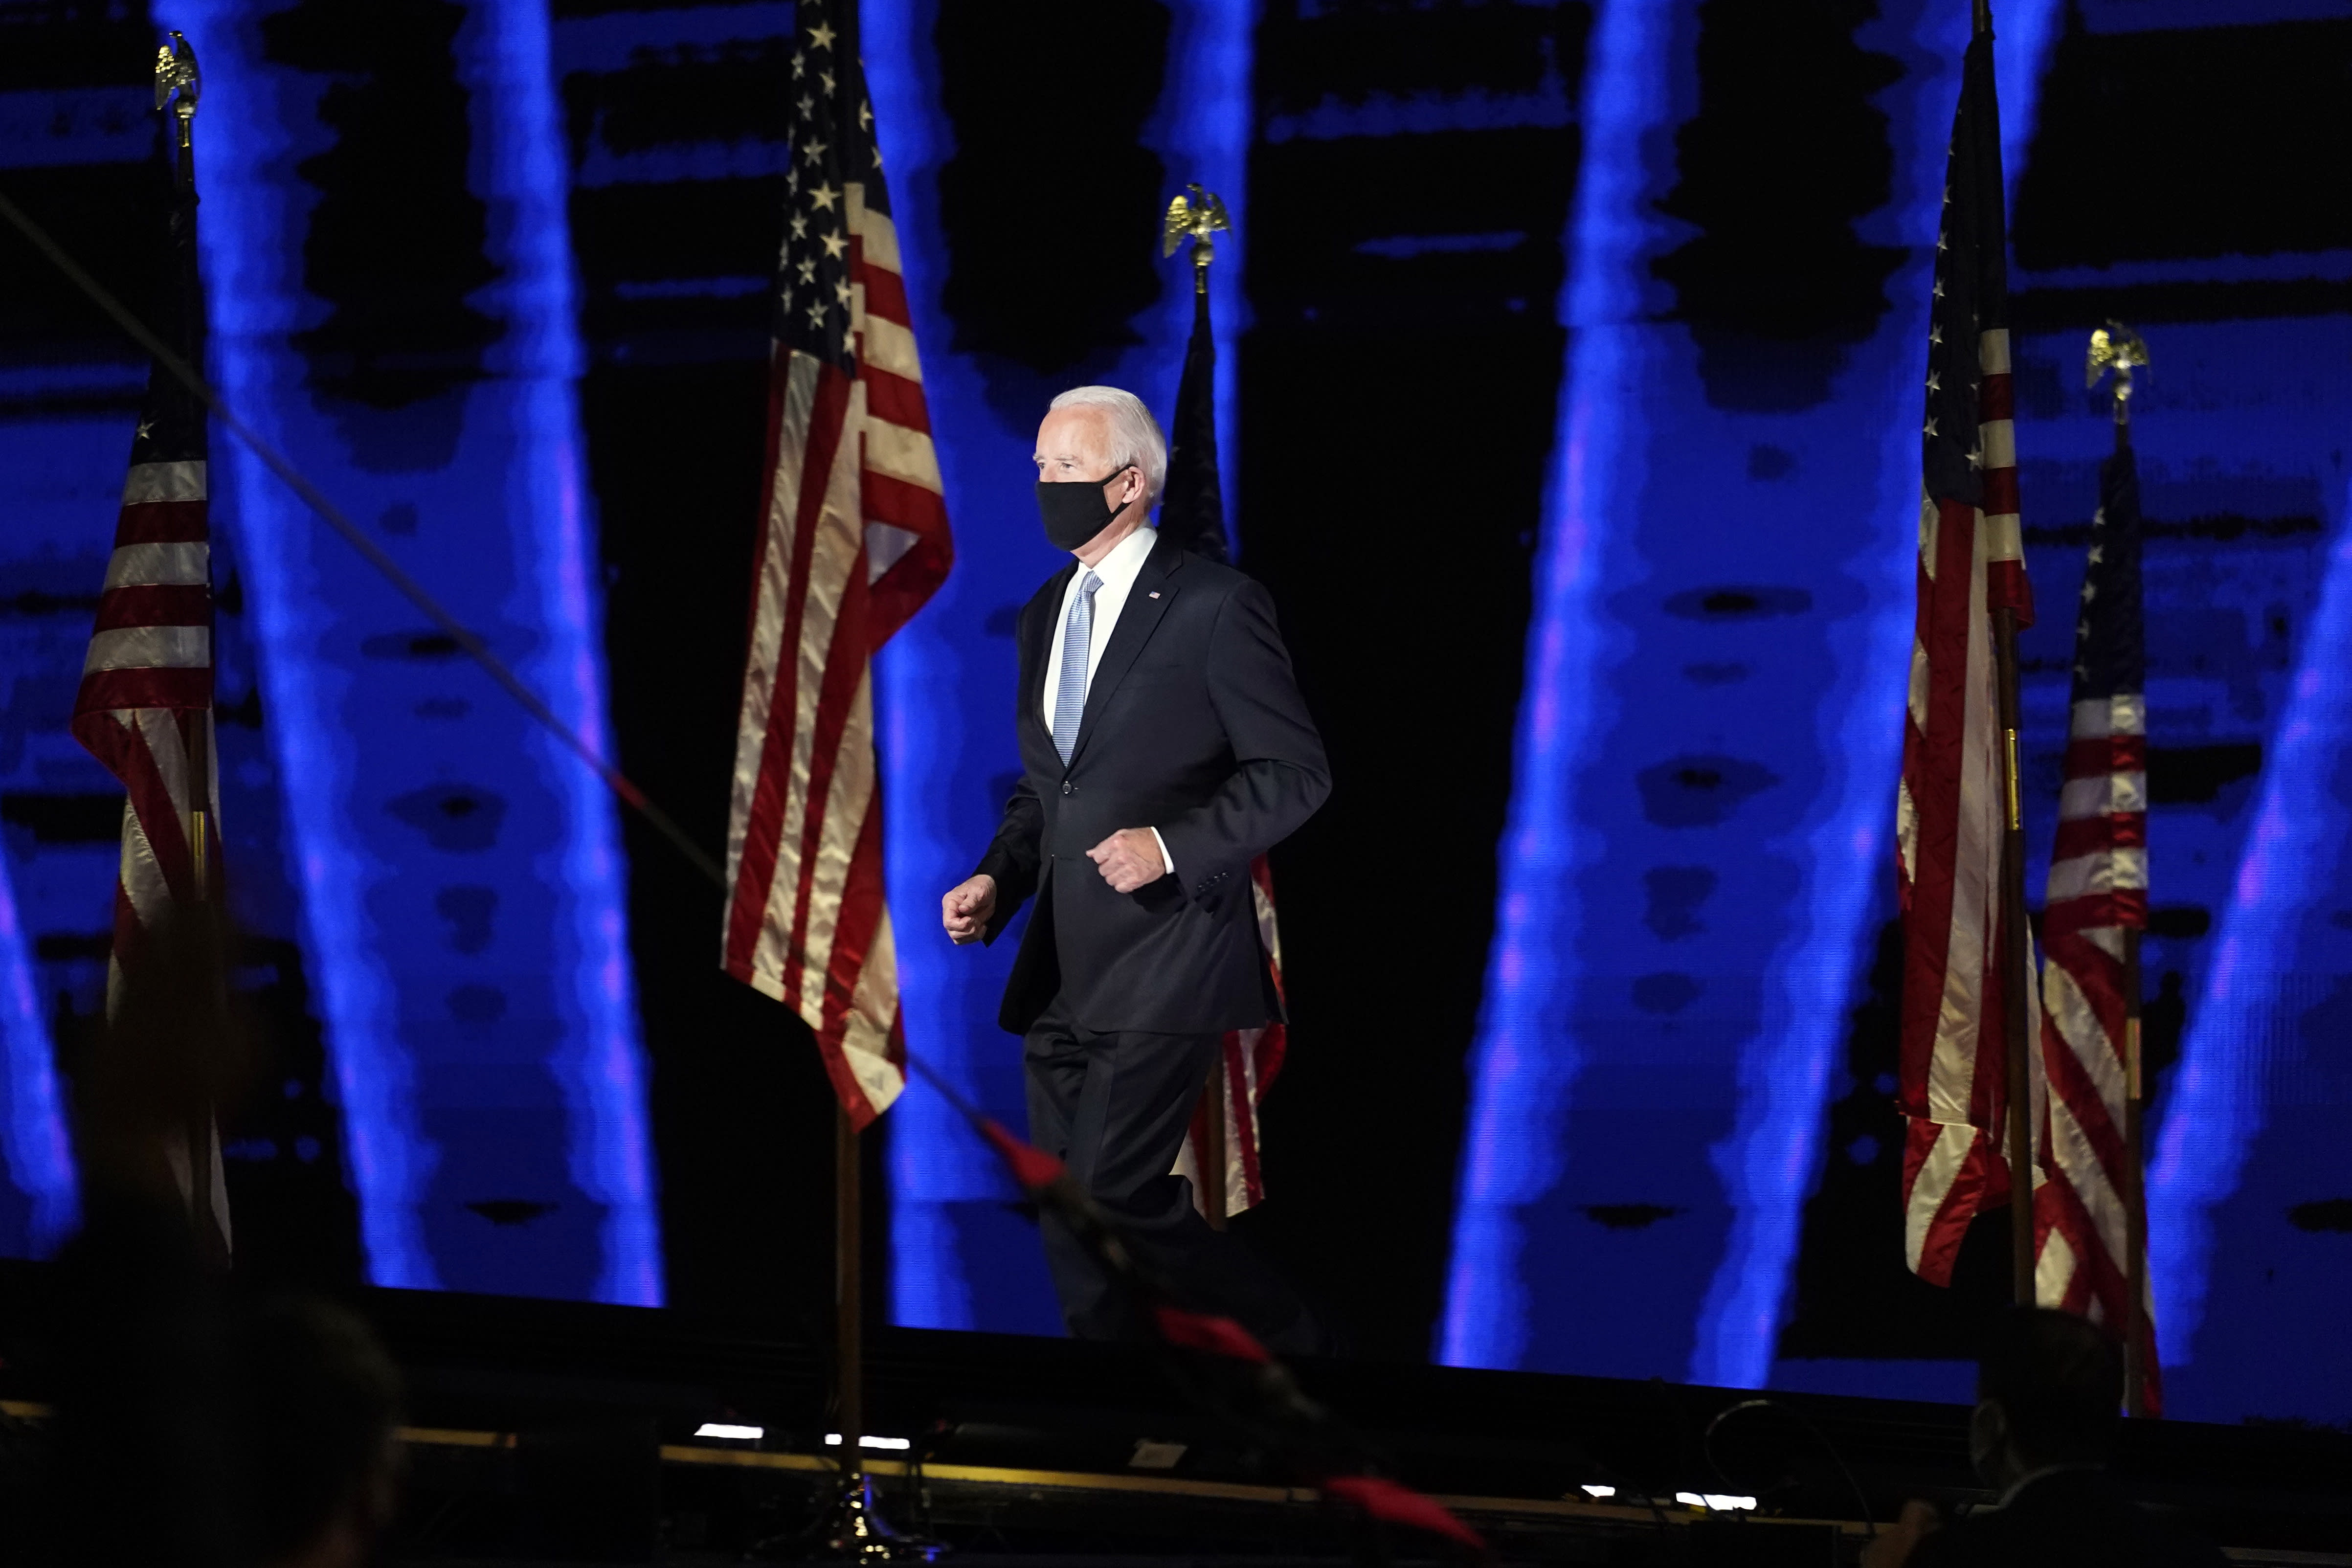 'Iconic': Joe Biden's 'victory jog' goes viral